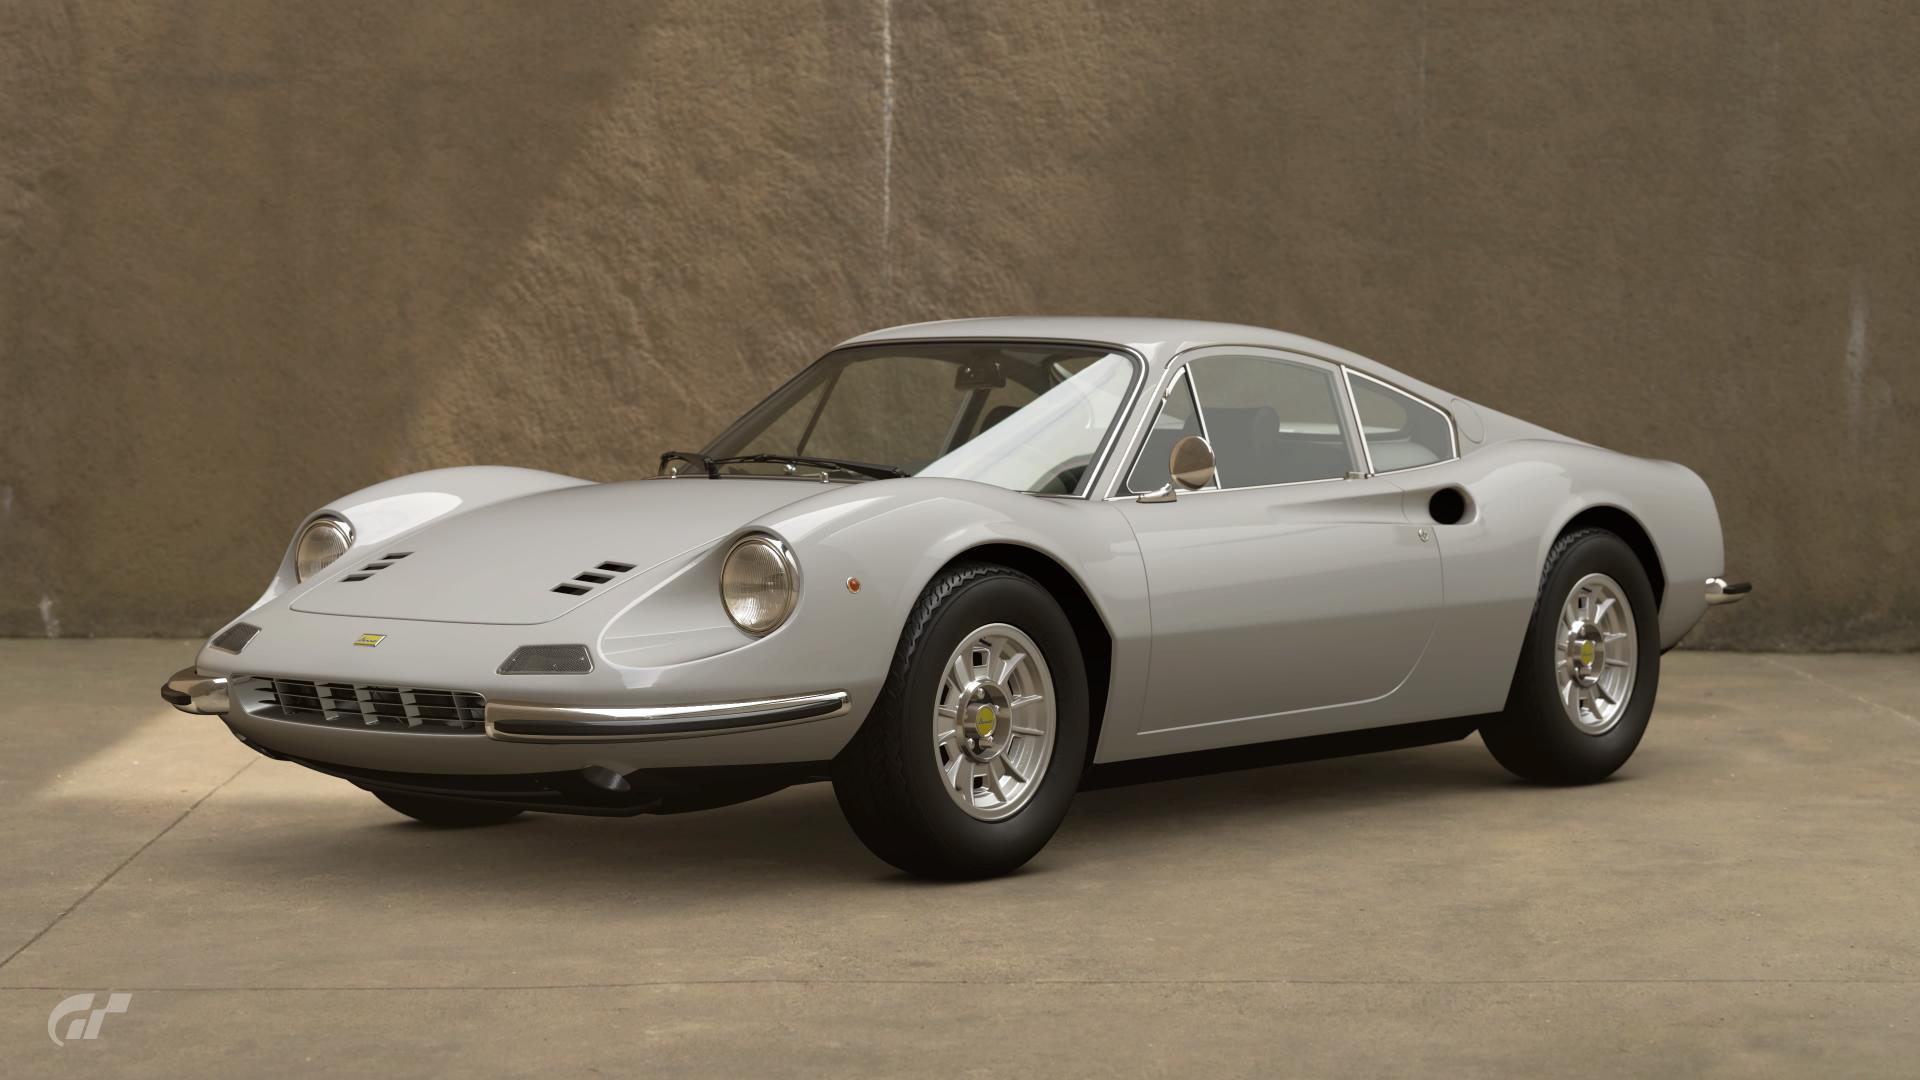 Ferrari Dino 246 GT '71   Gran Turismo Wiki   FANDOM powered by Wikia